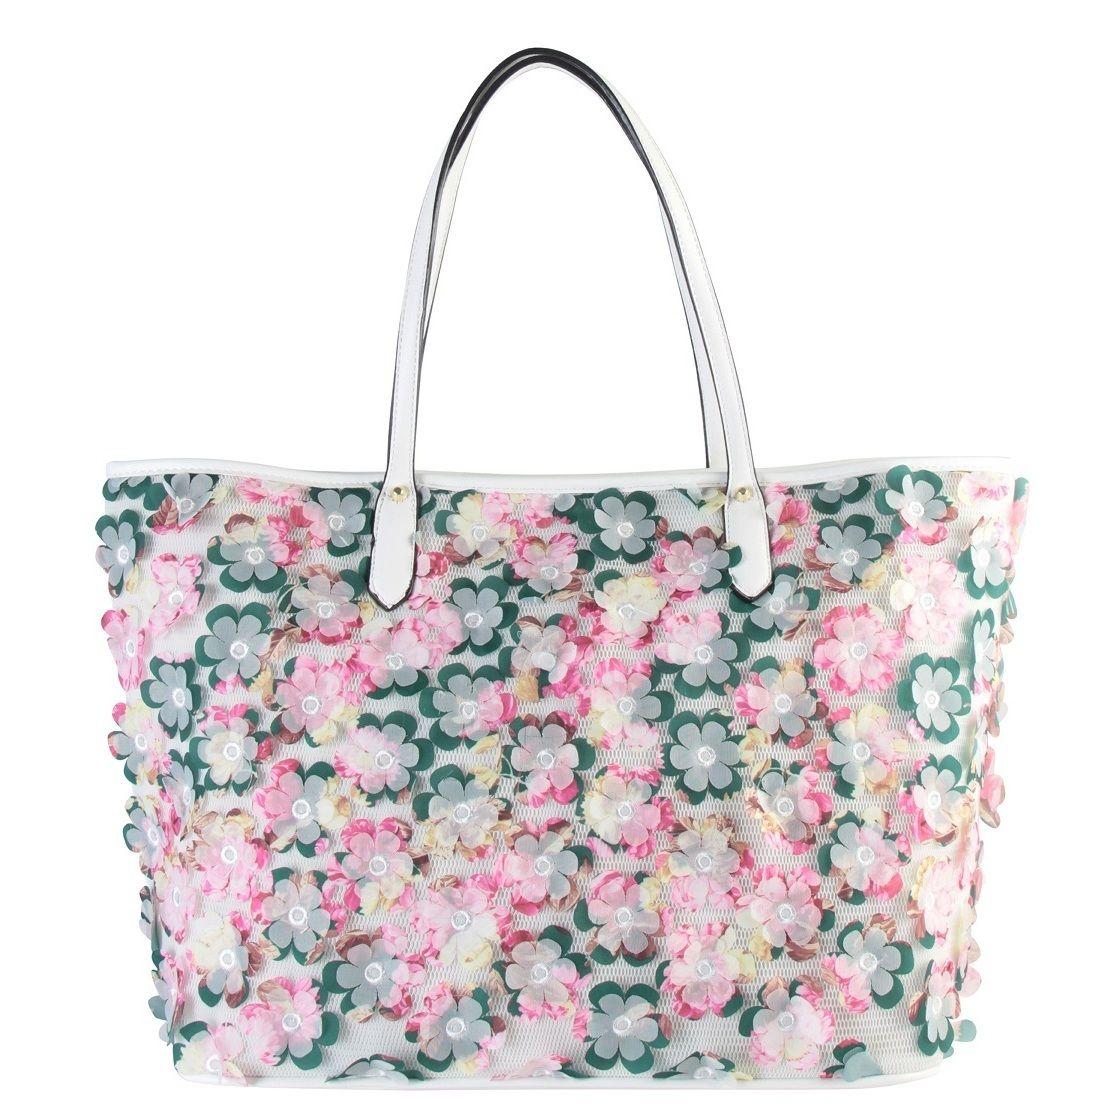 Diophy Faux Tote Handbag, Women's